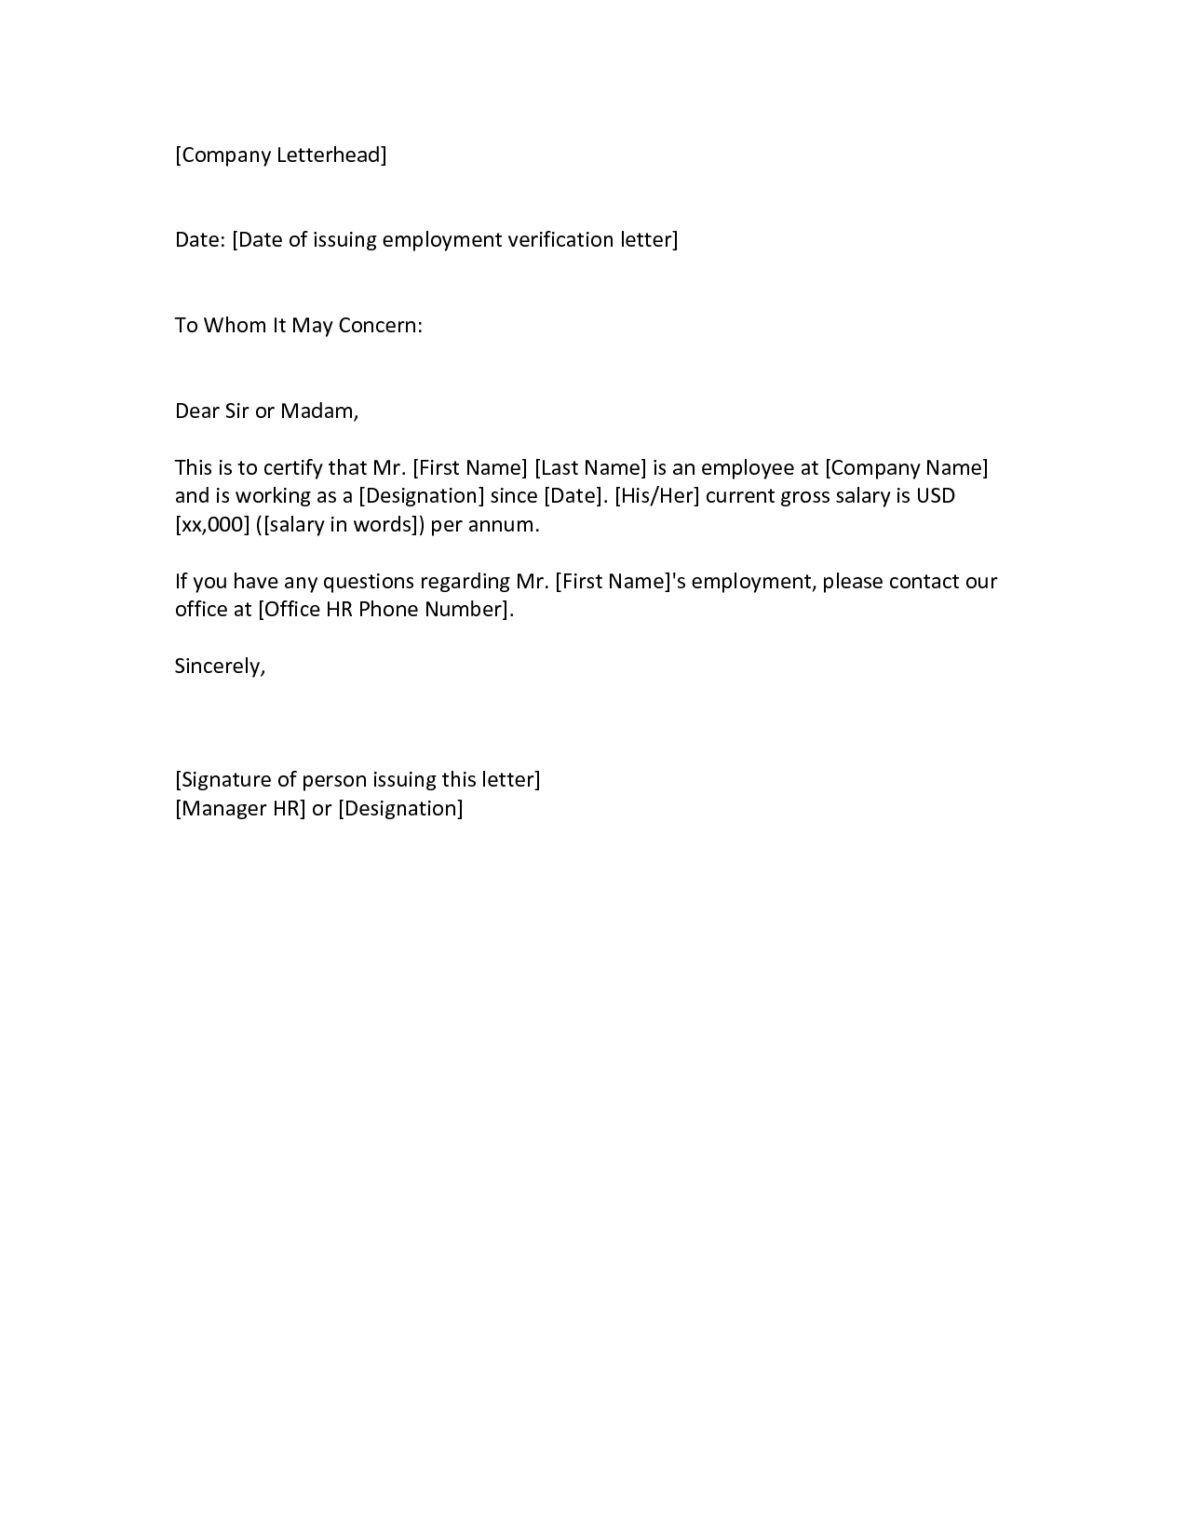 Verification Of Employment Template Morningperson Co In Employment Verification Letter Template Word Letter Template Word Lettering Letter Templates